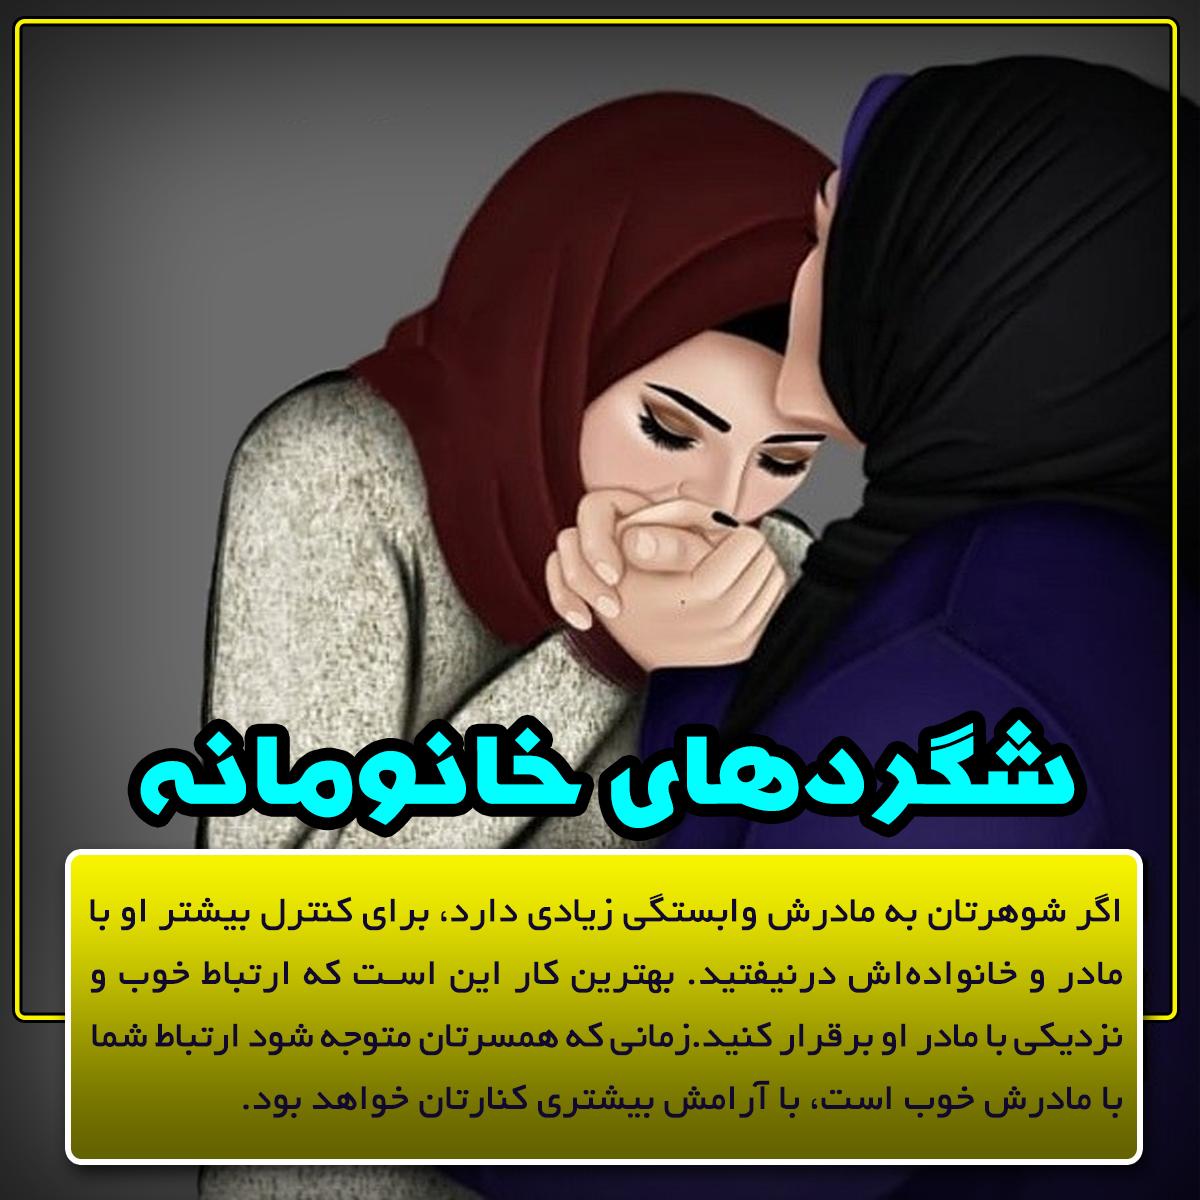 مادر شوهر,مادر,عروس و مادر شوهر,رابطه با مادر شوهر